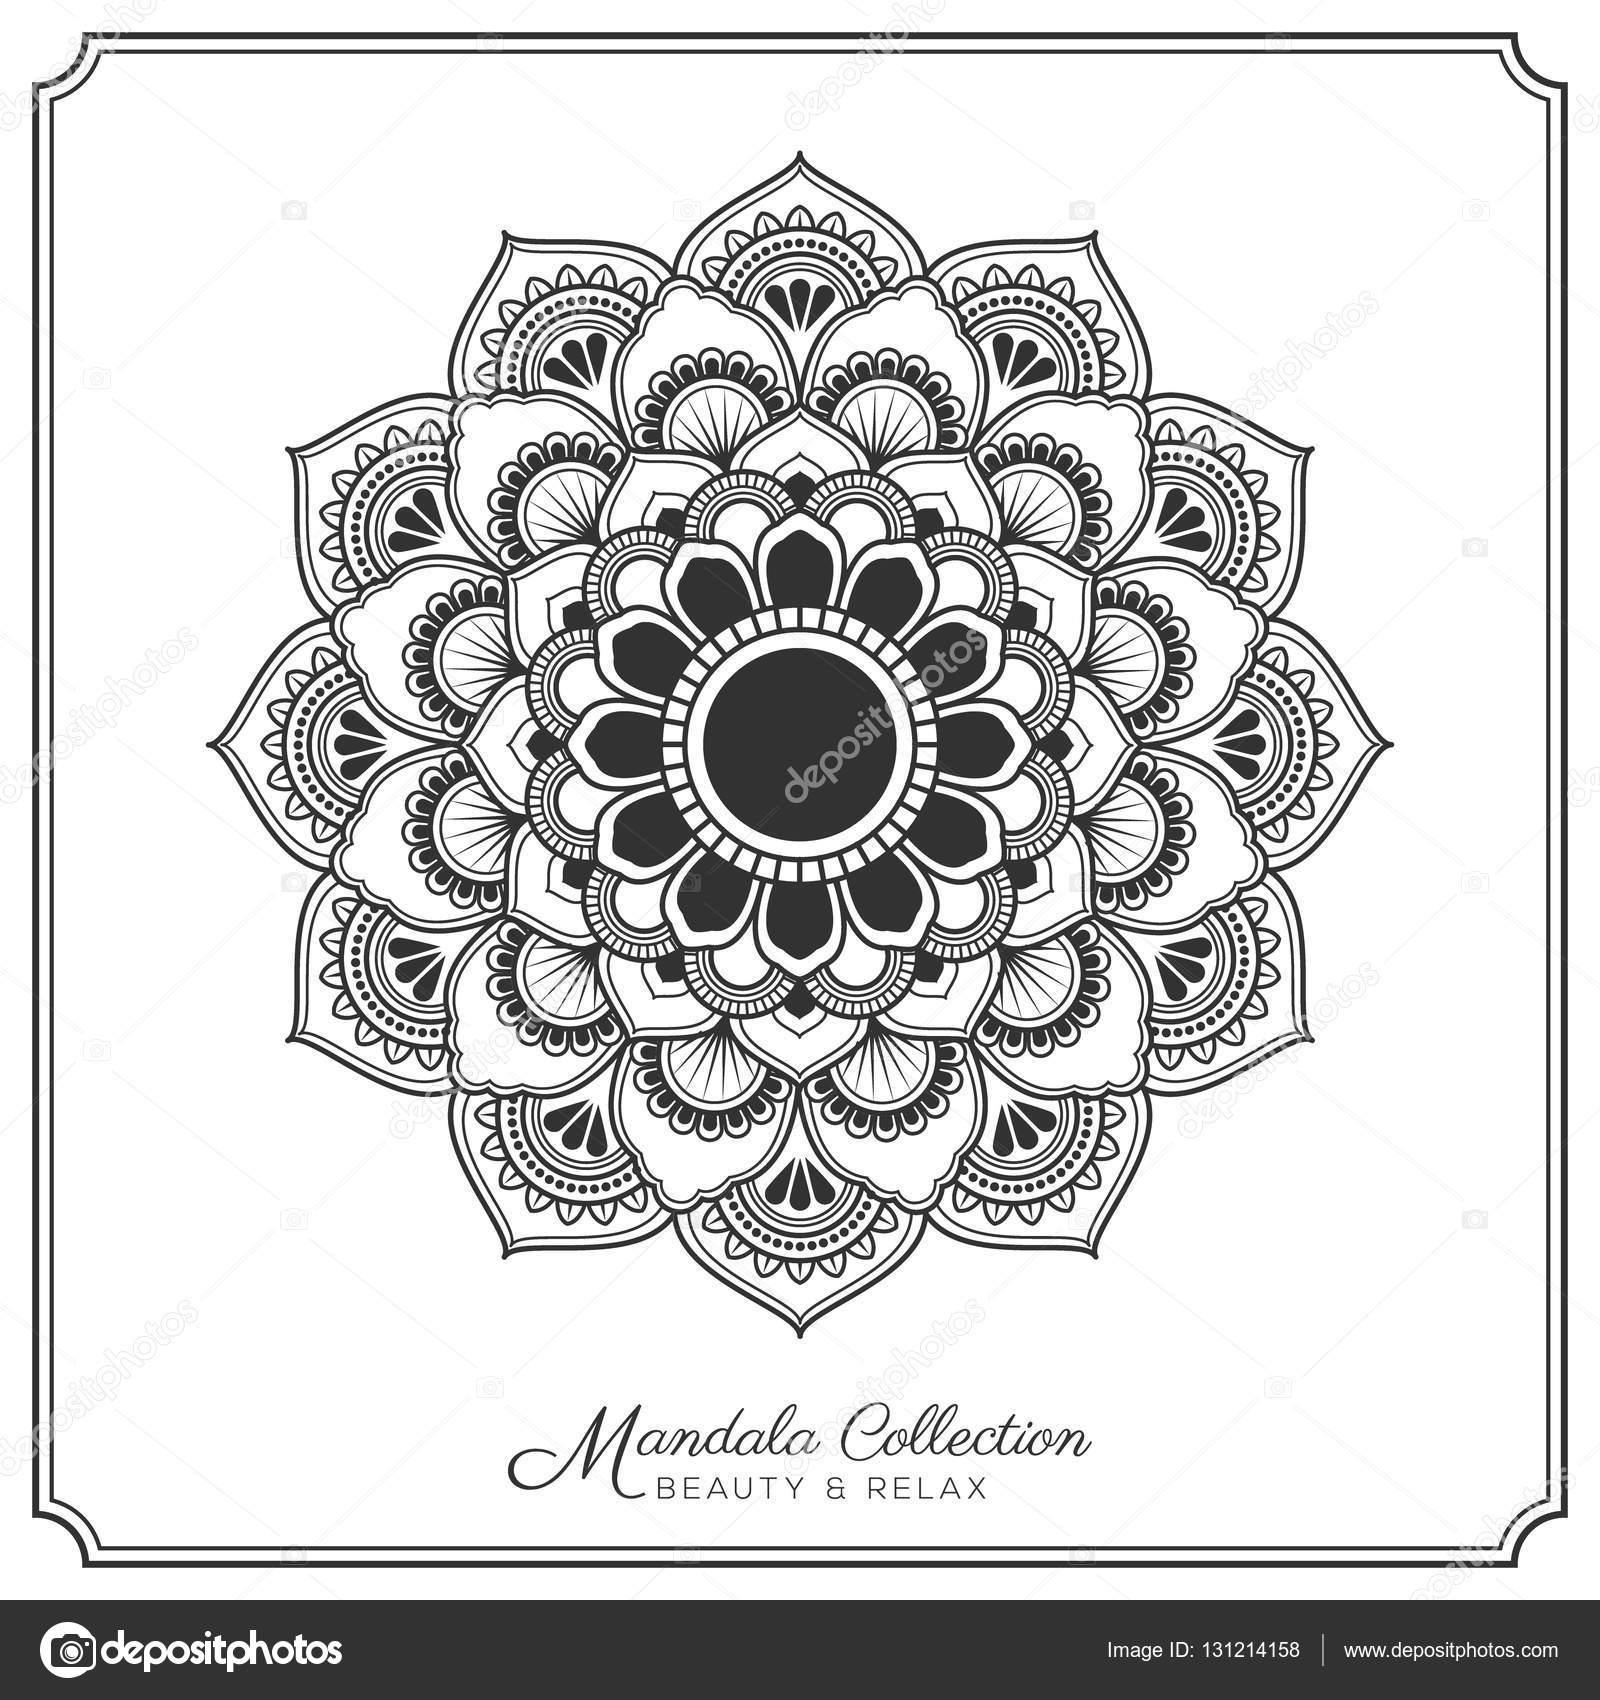 Diseño De Mandalas Para Tatuajes Diseño Del Tatuaje Y El Ornamento